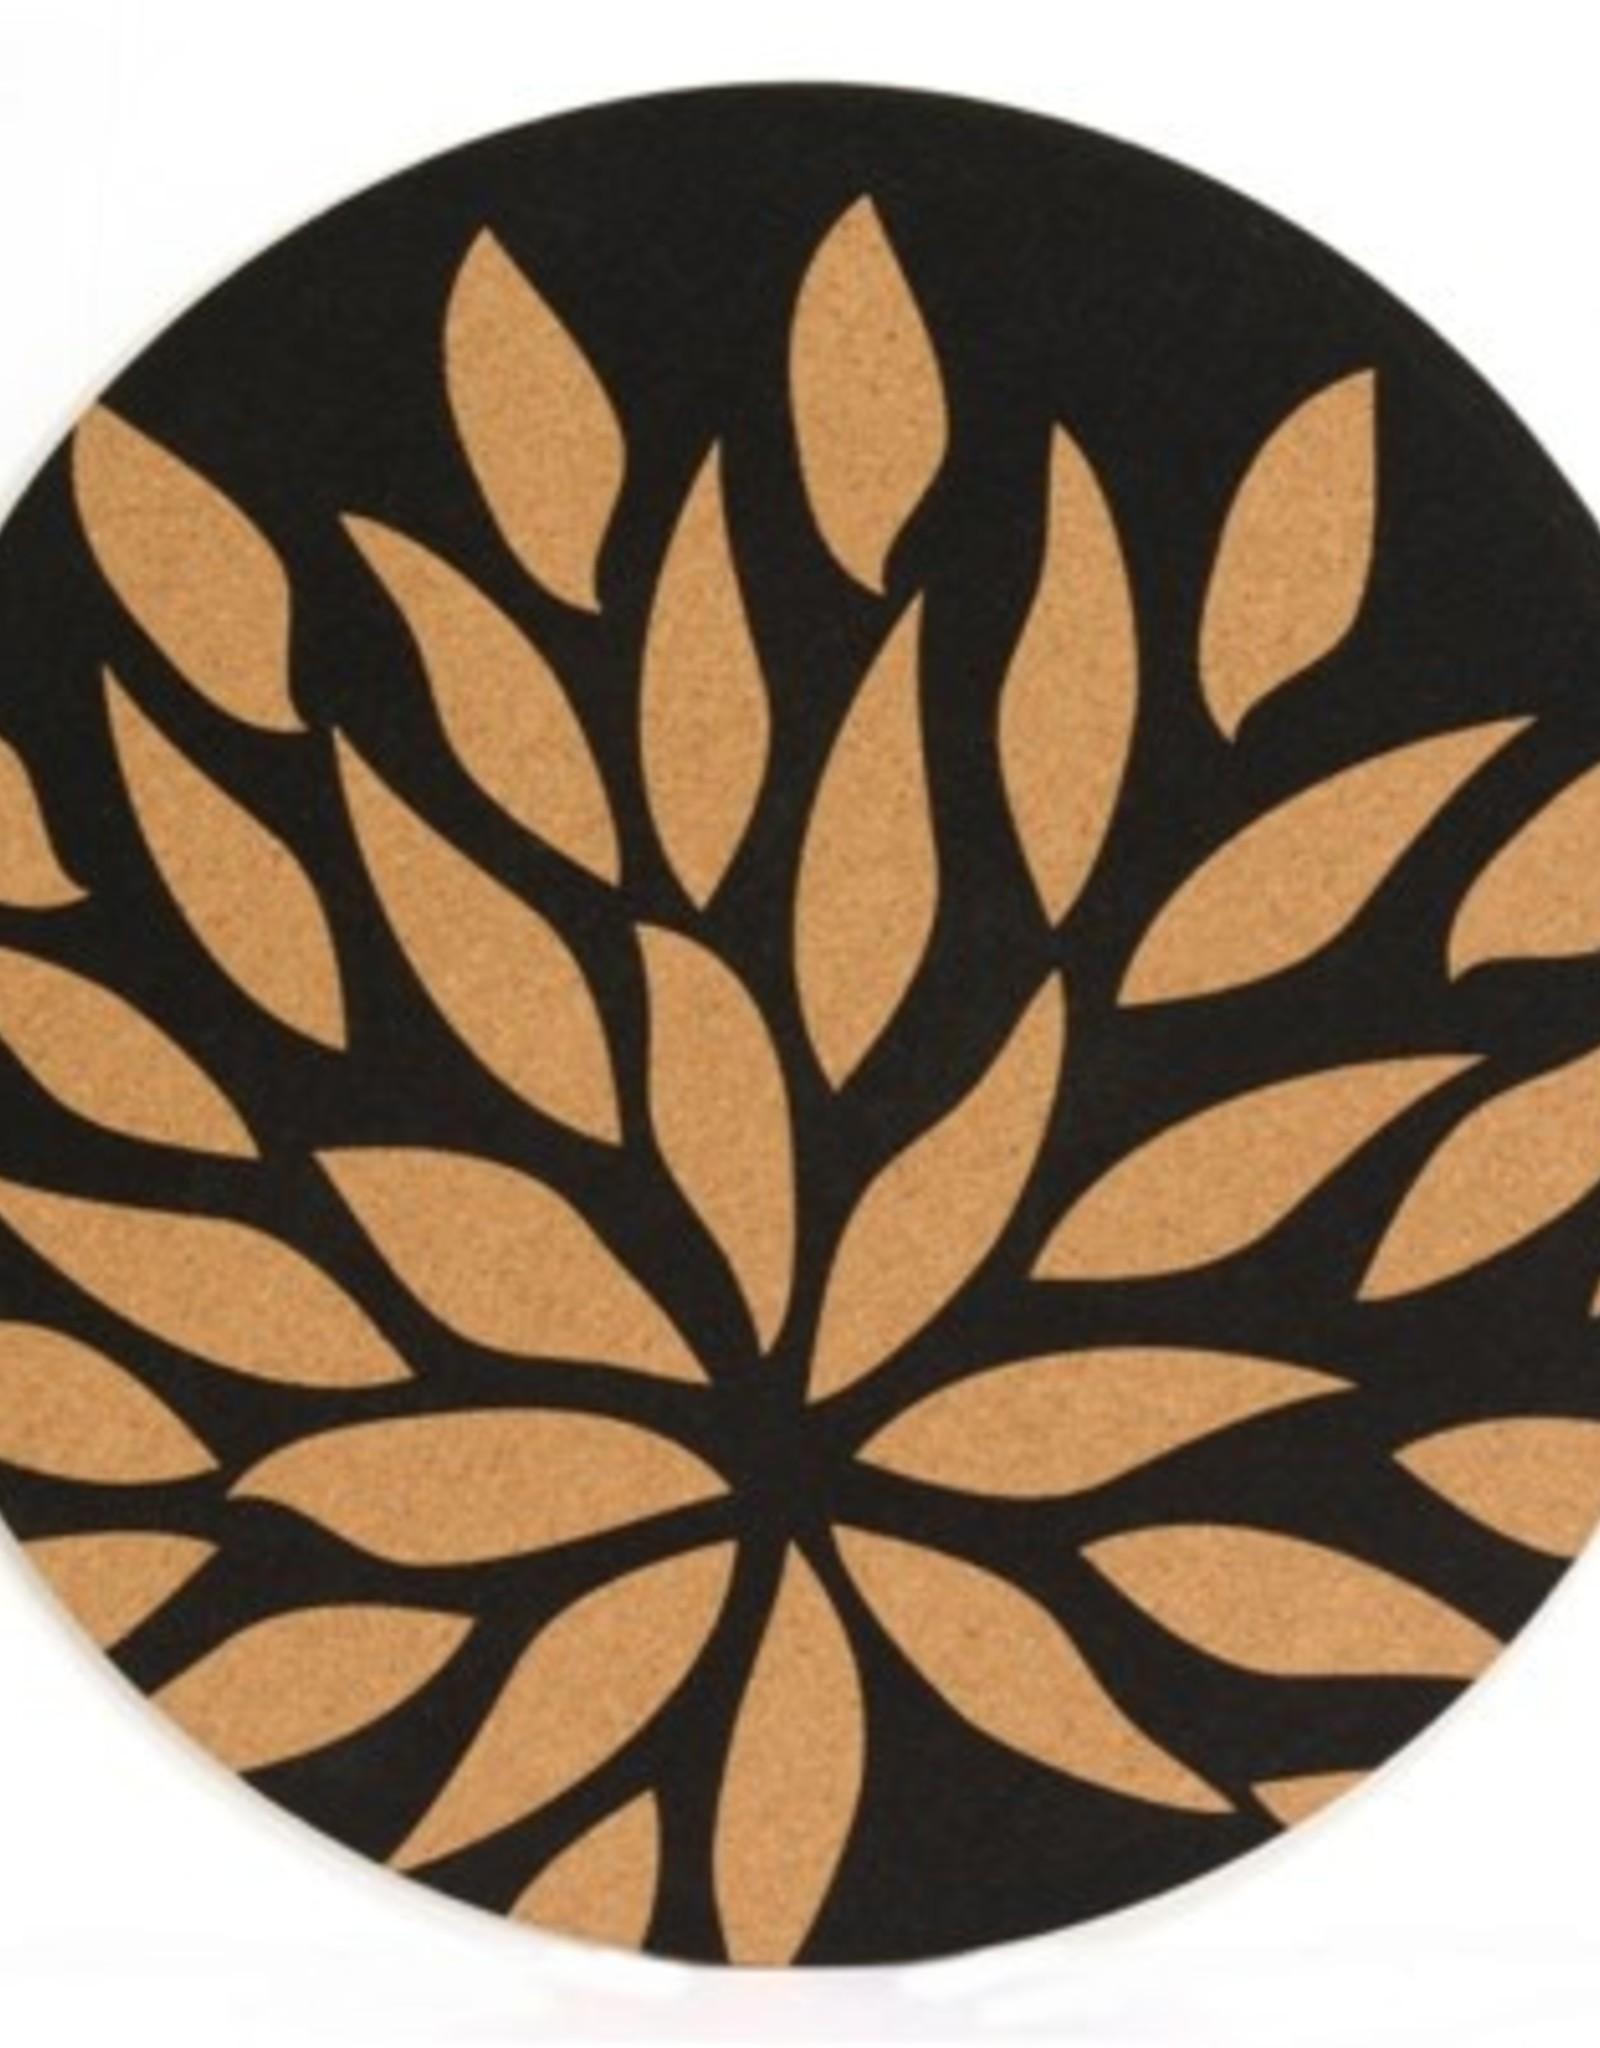 Placemat Harman Flower Cork Printed Round Black